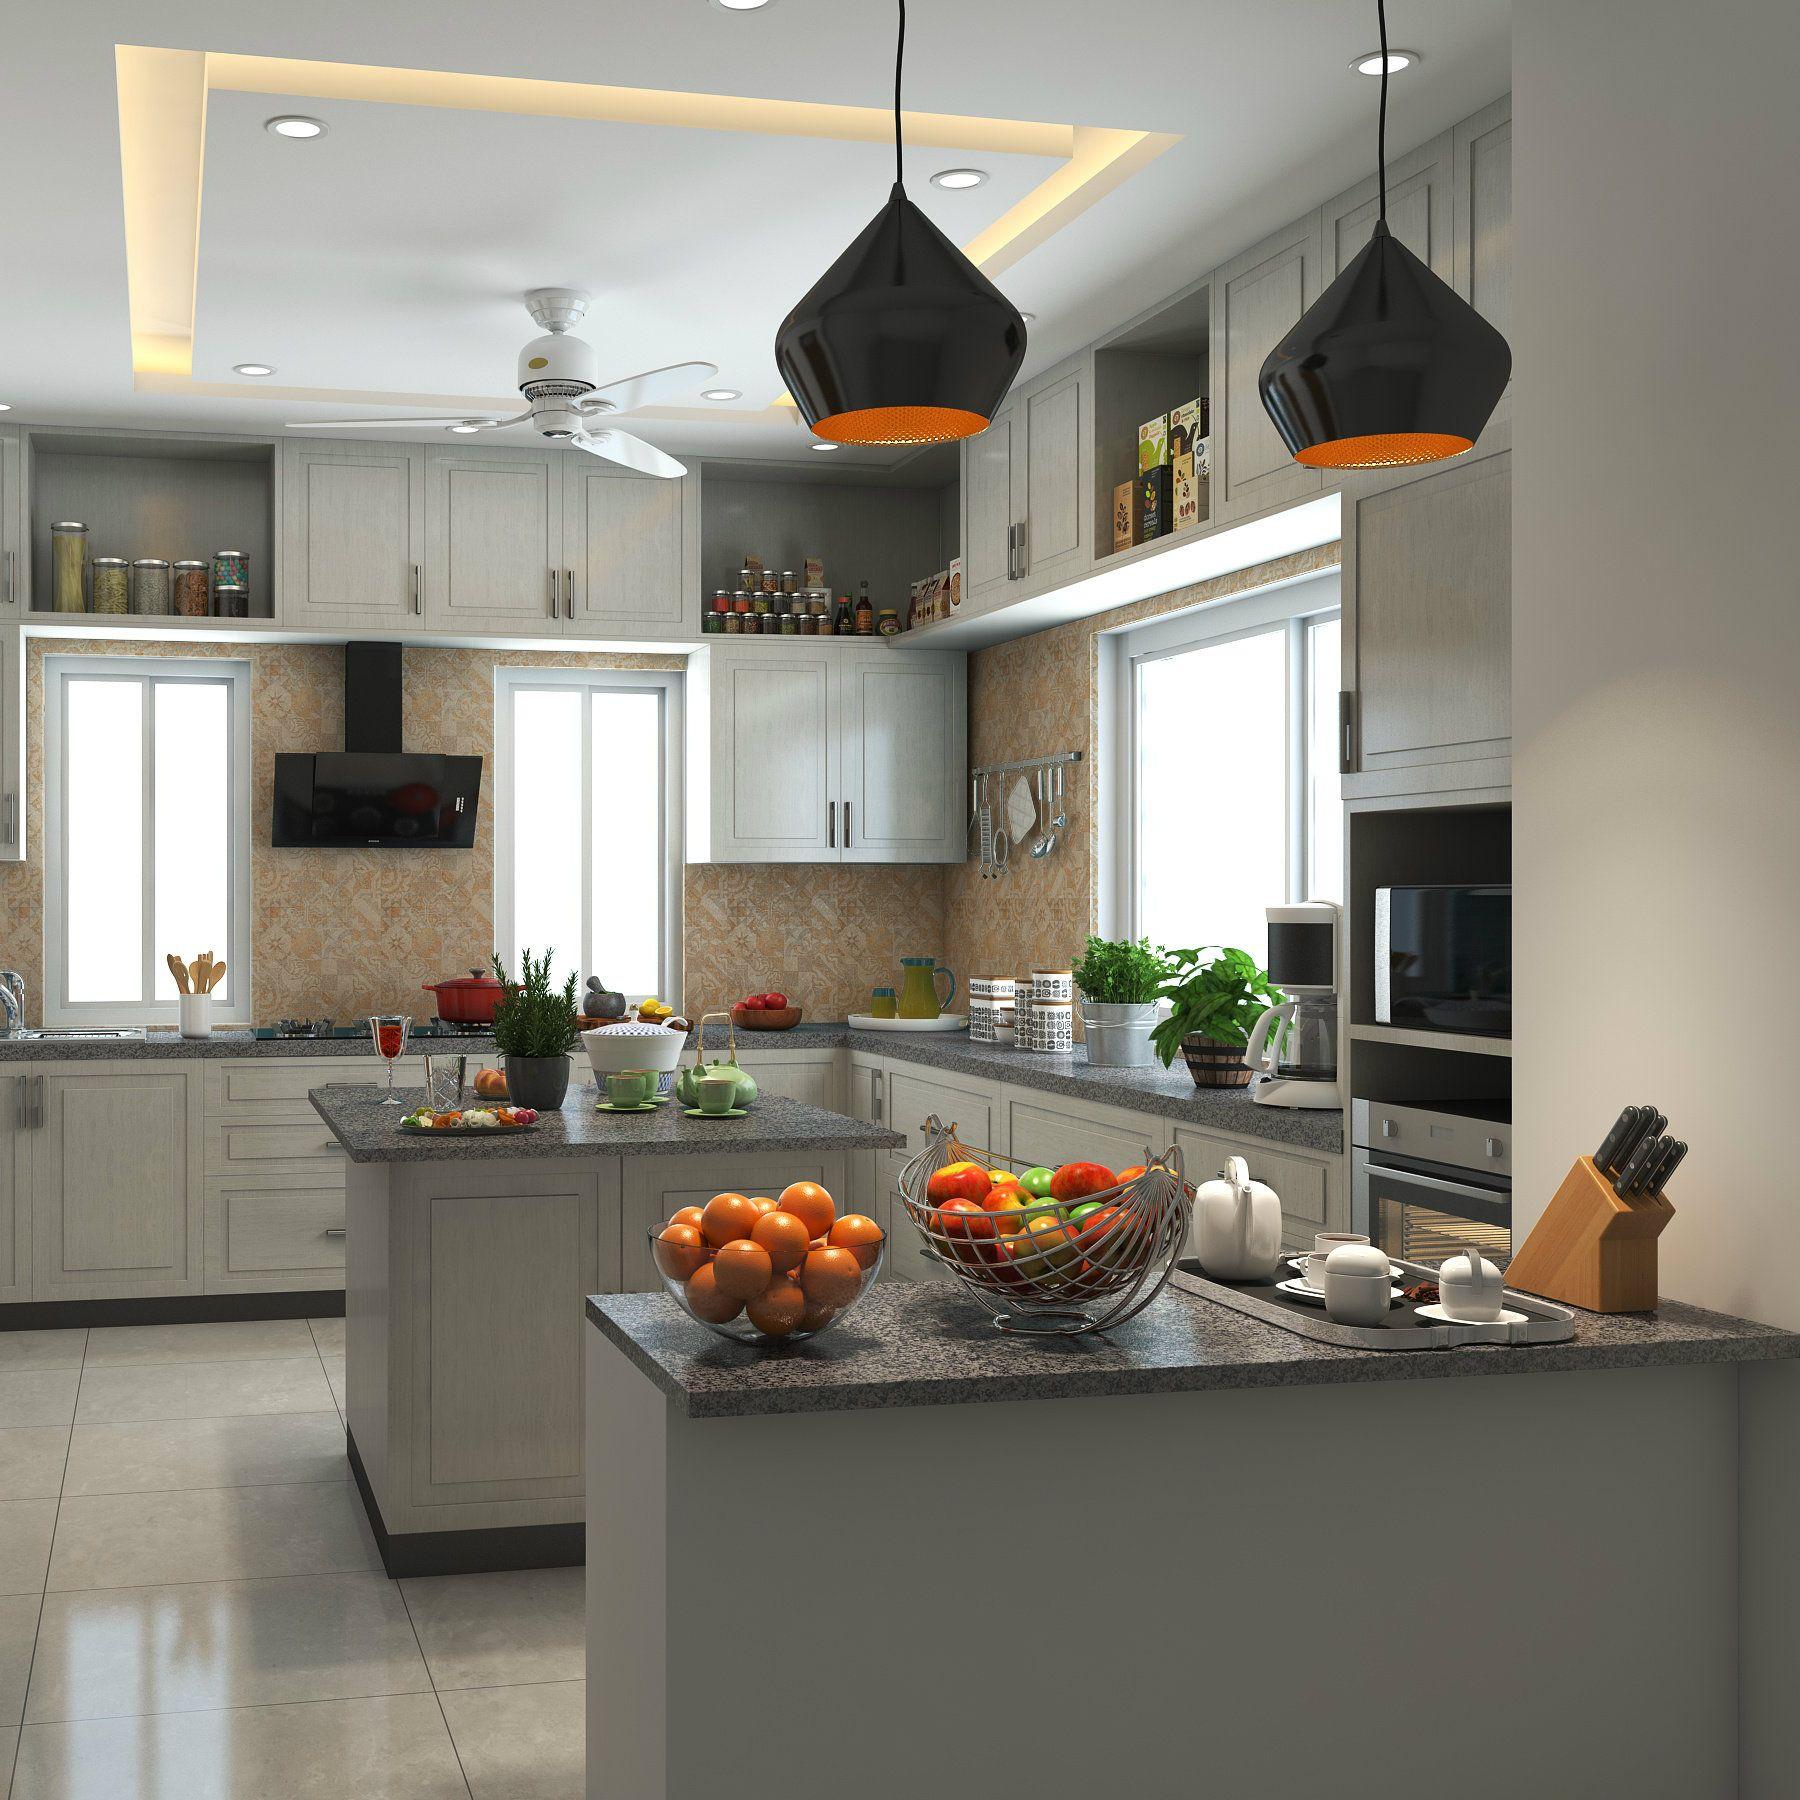 An Elegant Kitchen With Beautiful Pendant Lights White Island